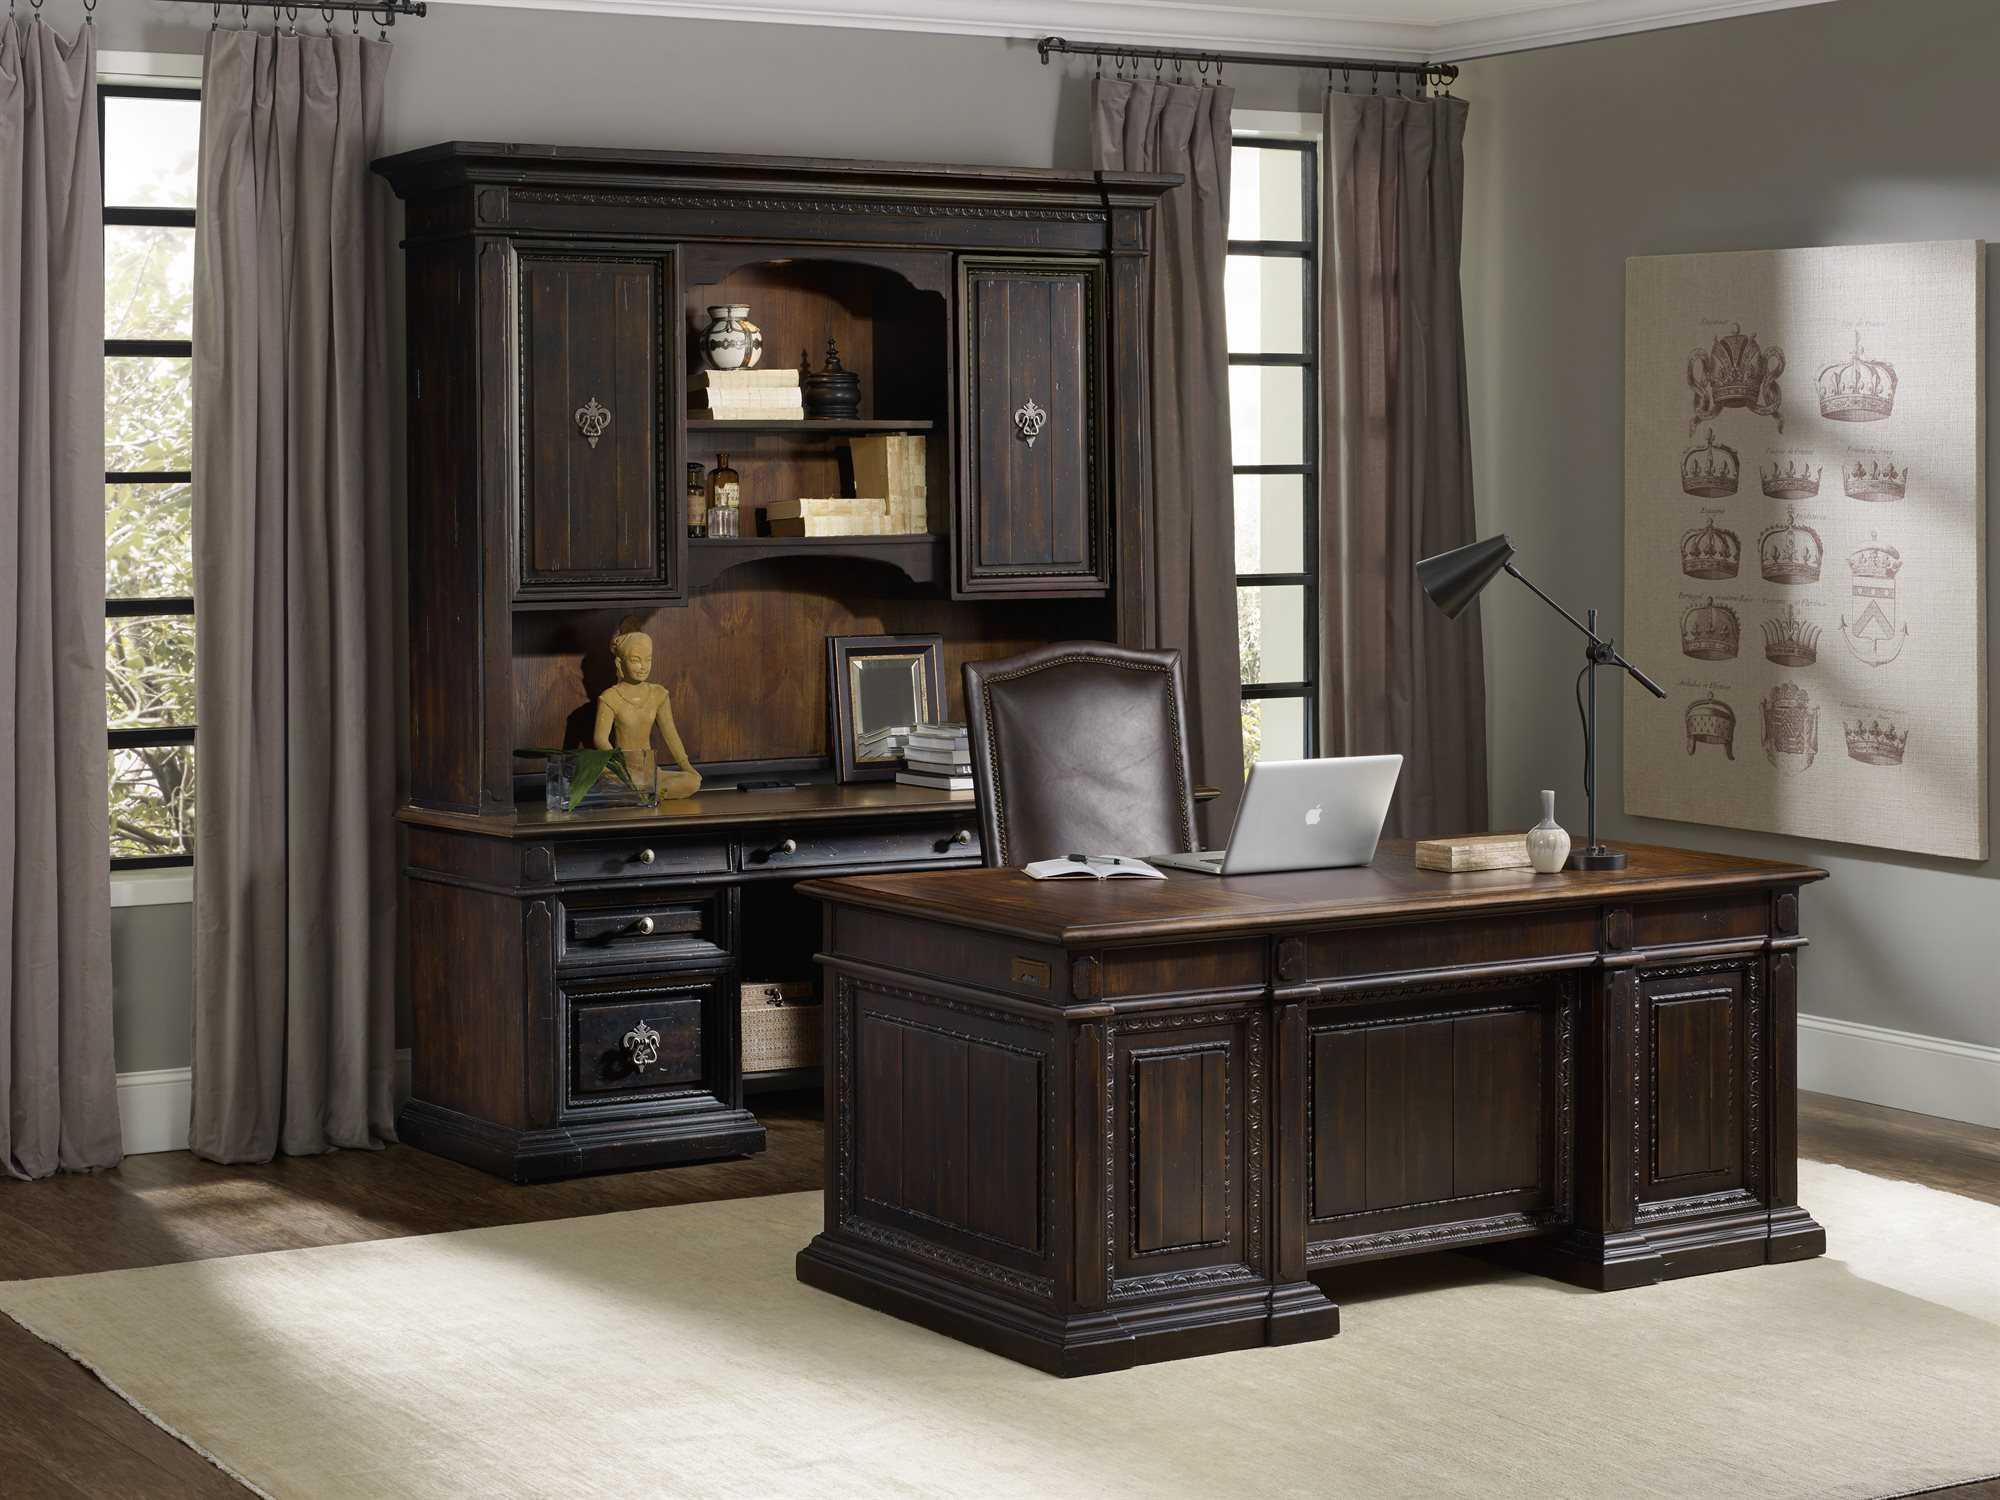 hooker furniture treviso home office set hoo537410464set